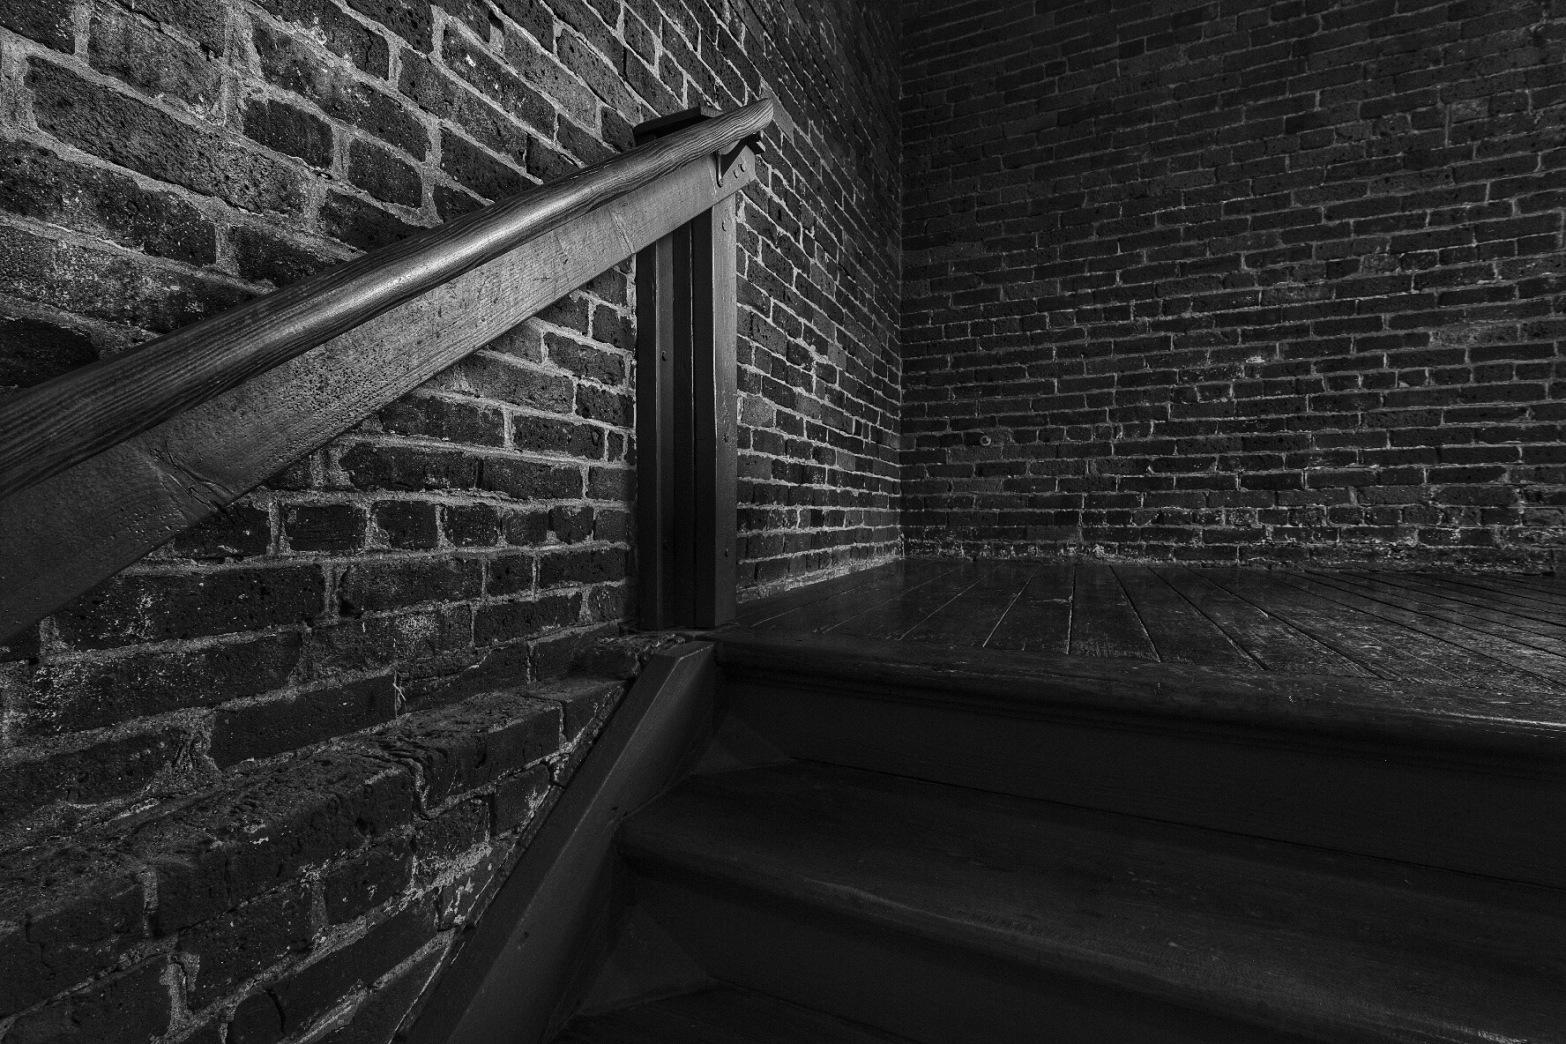 Dark shadowy stairway in an old brick mill building.